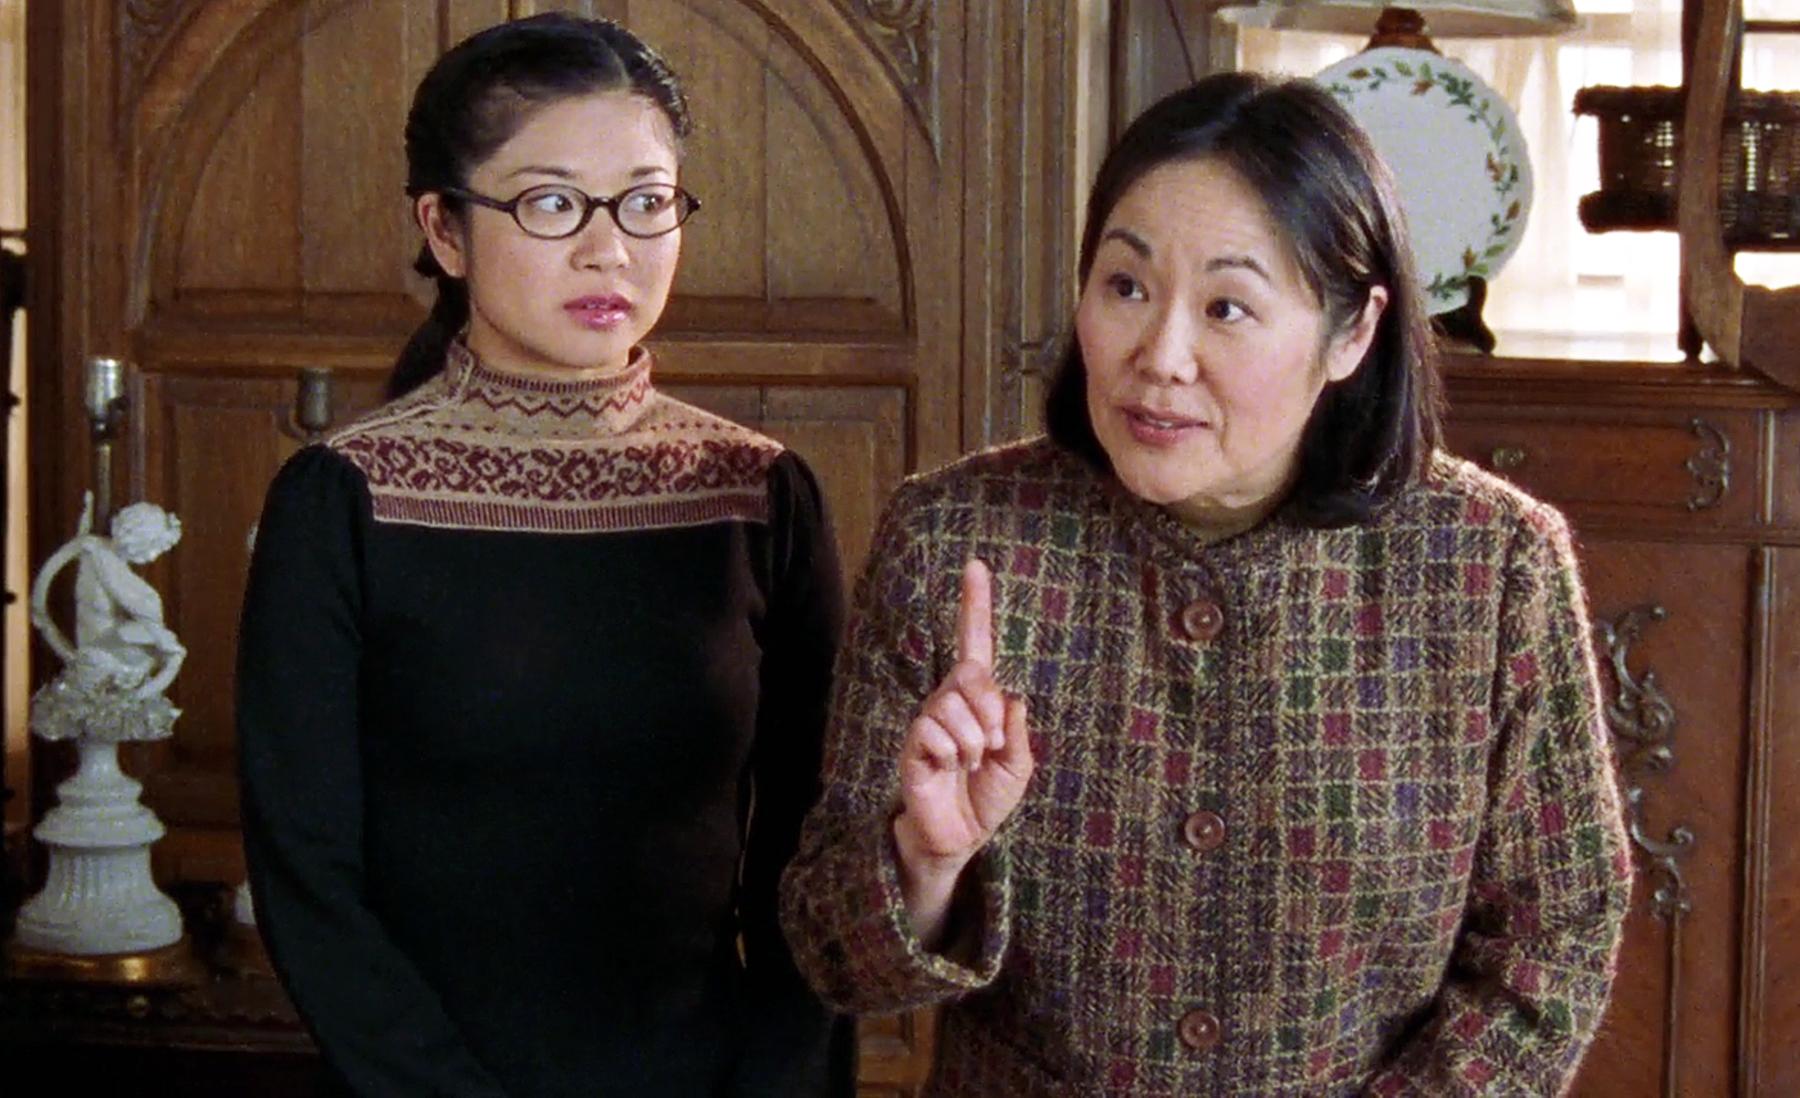 Keiko Agena & Emily Kuroda on Gilmore Girls